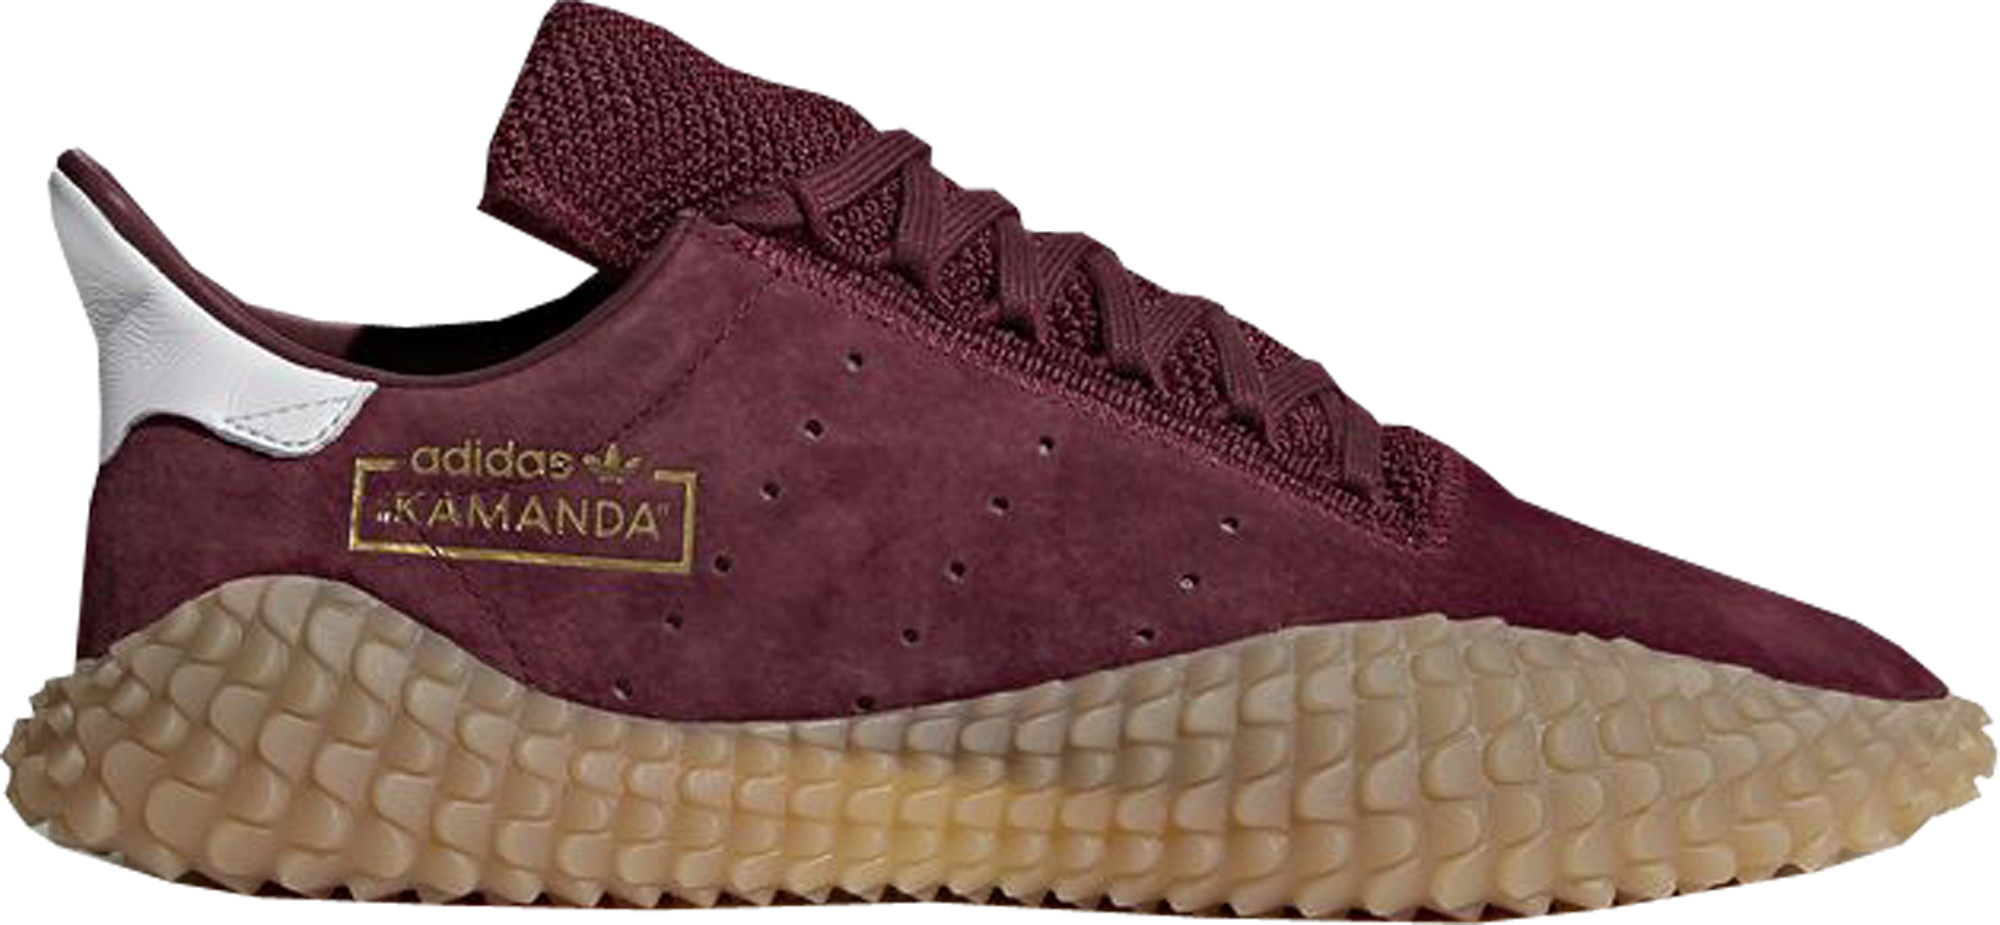 adidas Kamanda Burgundy Gum